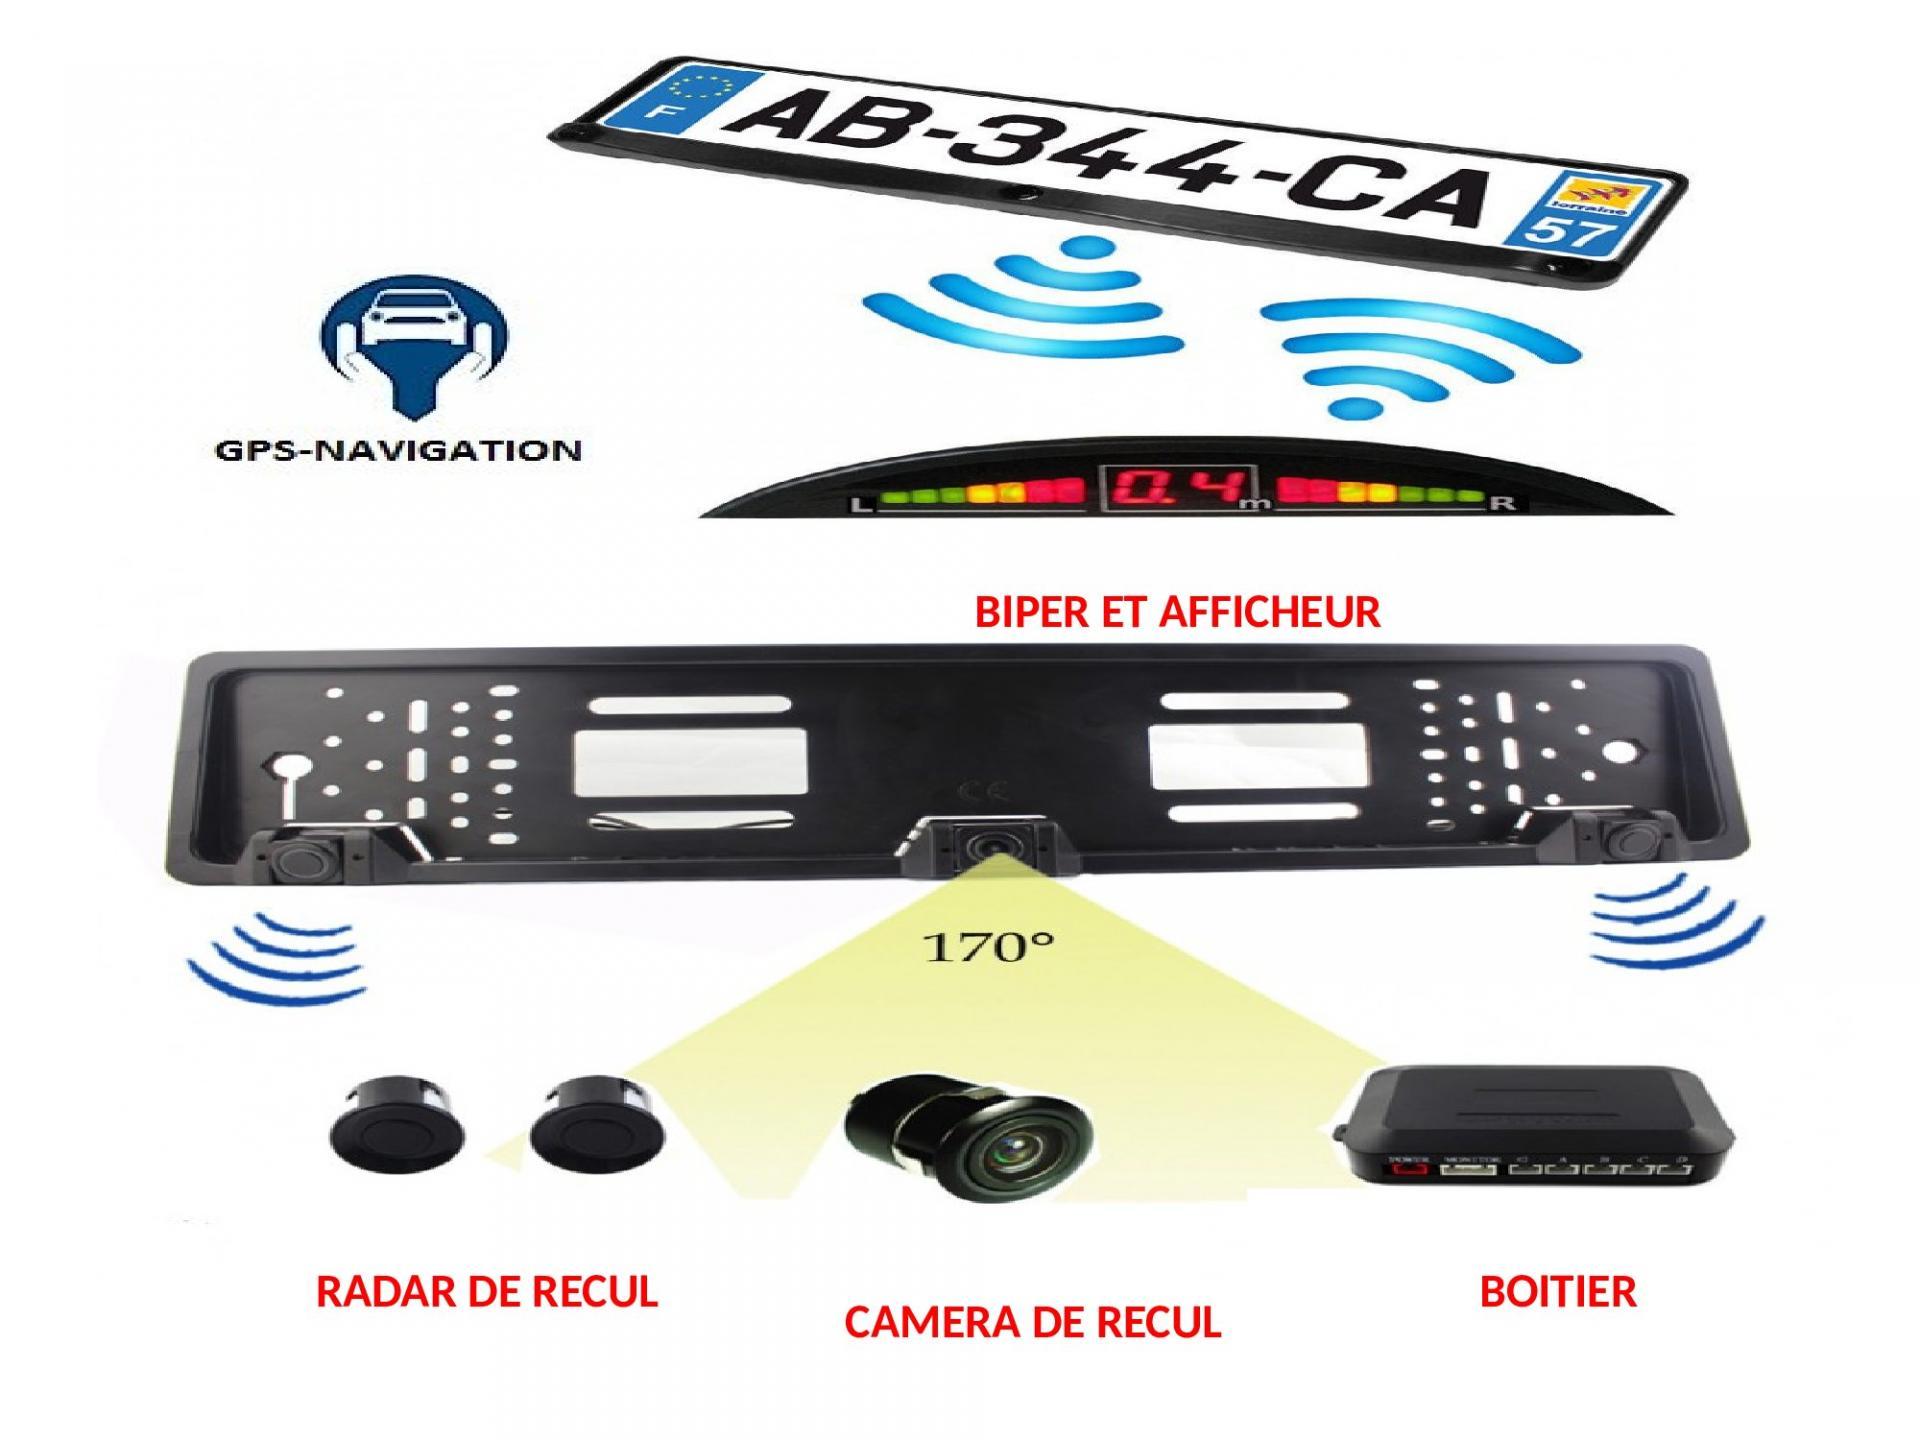 Sans fil wifi cadre de plaque d immatriculation camera de recul de recul radar de recul vision nocture 2 2